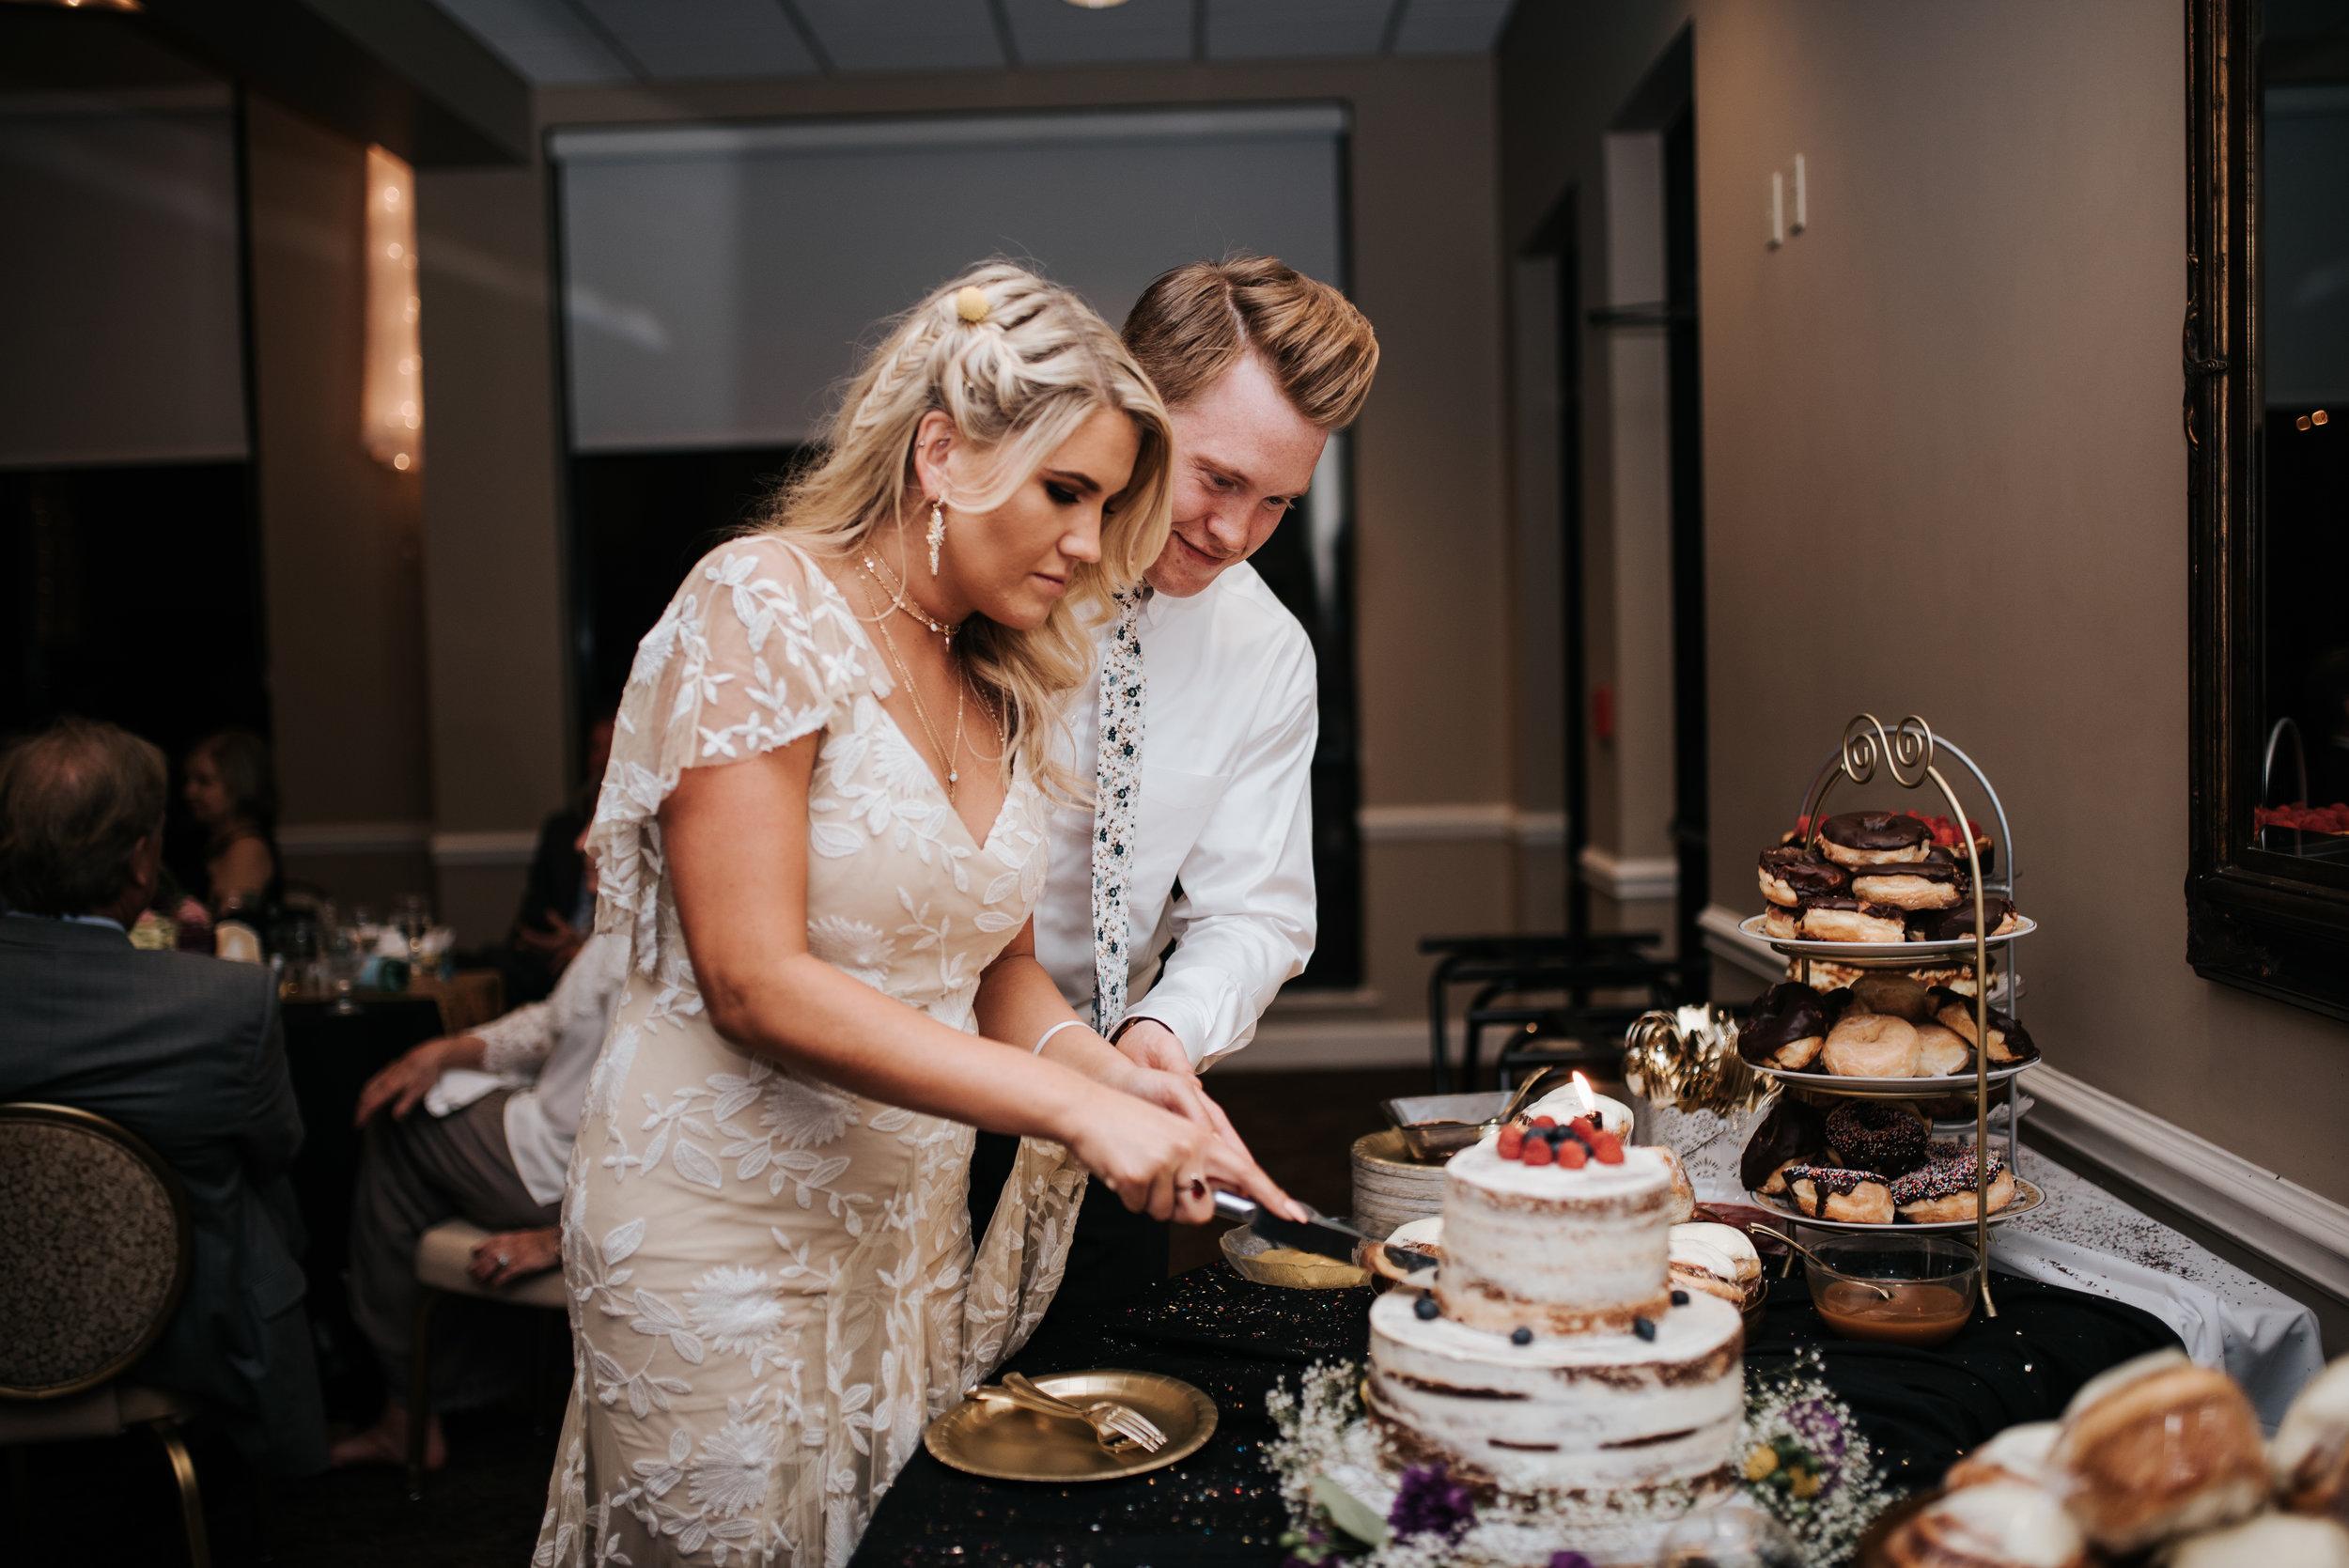 zayda-collin-panama-city-wedding-photography-trippy-bohemian-lisa-frank-wedding-reception-60.jpg